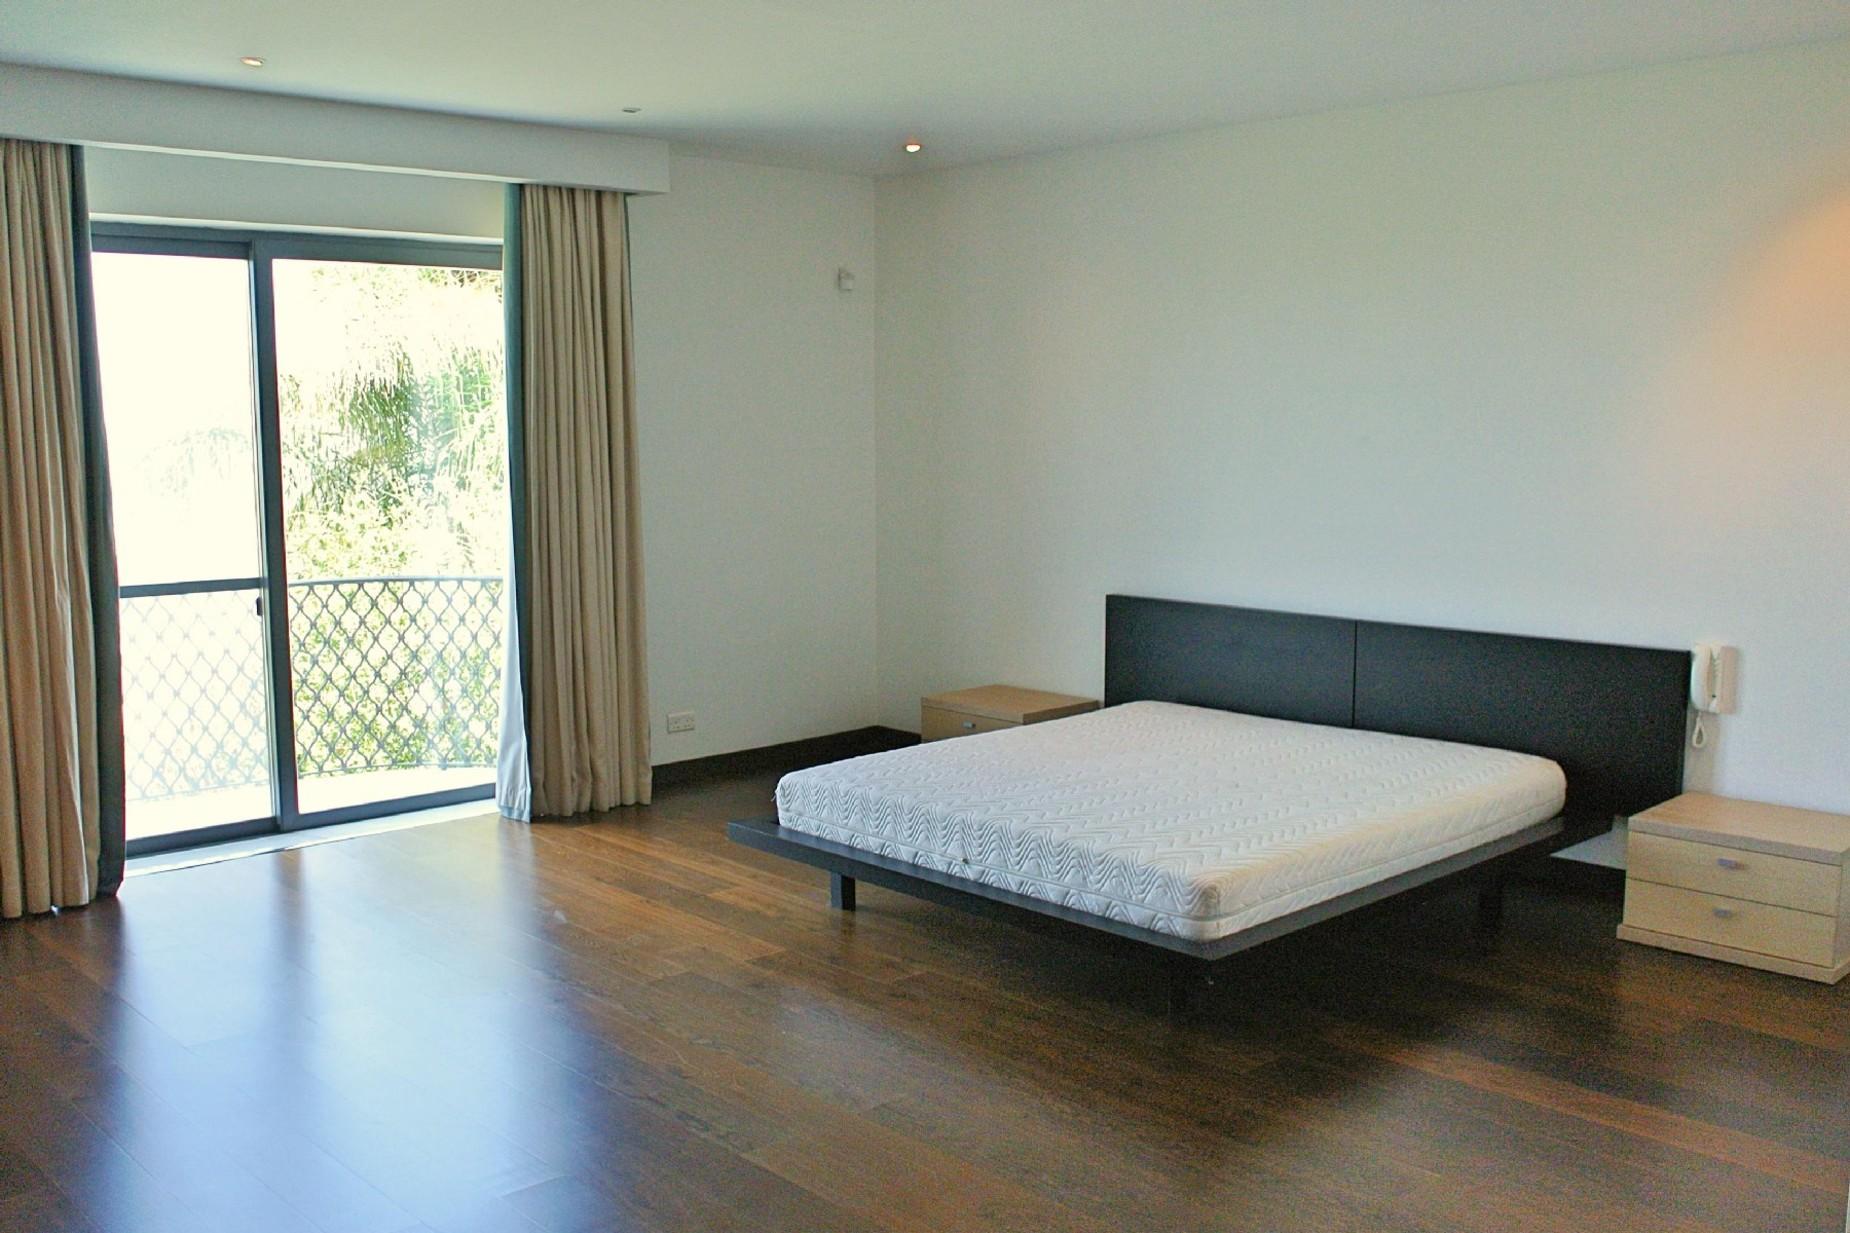 4 bed Villa For Rent in Bahar ic-Caghaq, Bahar ic-Caghaq - thumb 5